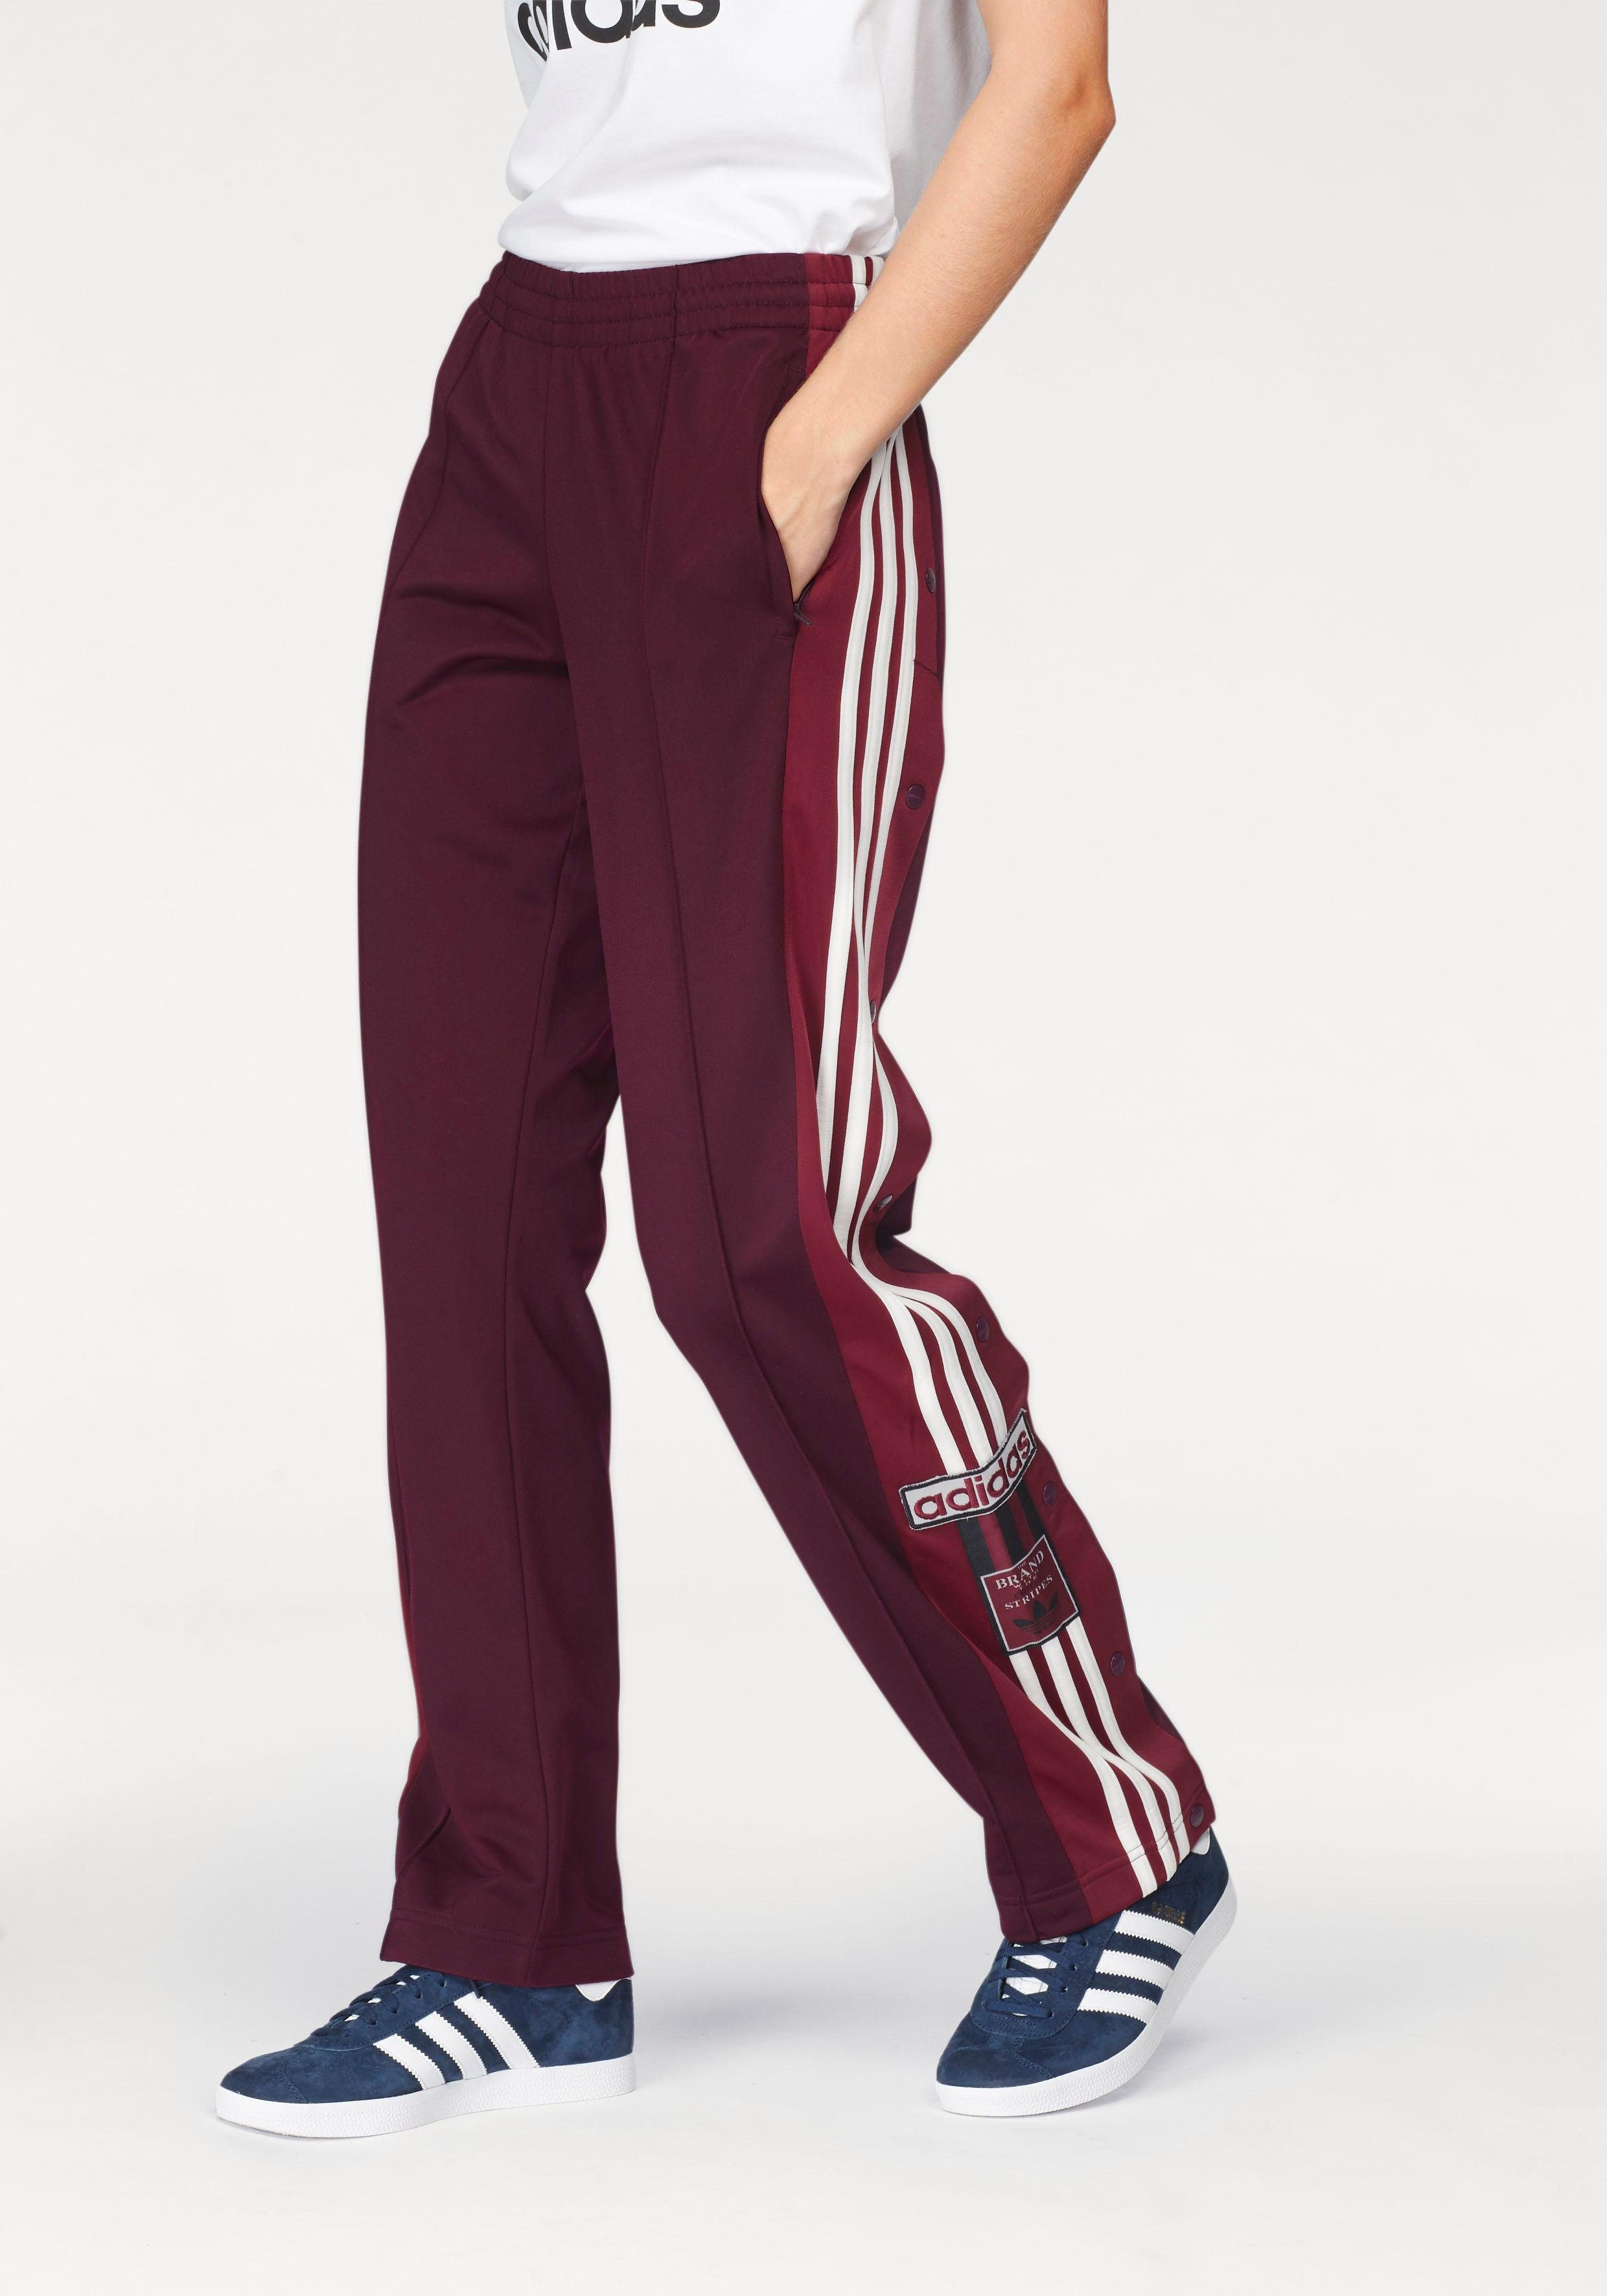 adidas originals dames broek rood